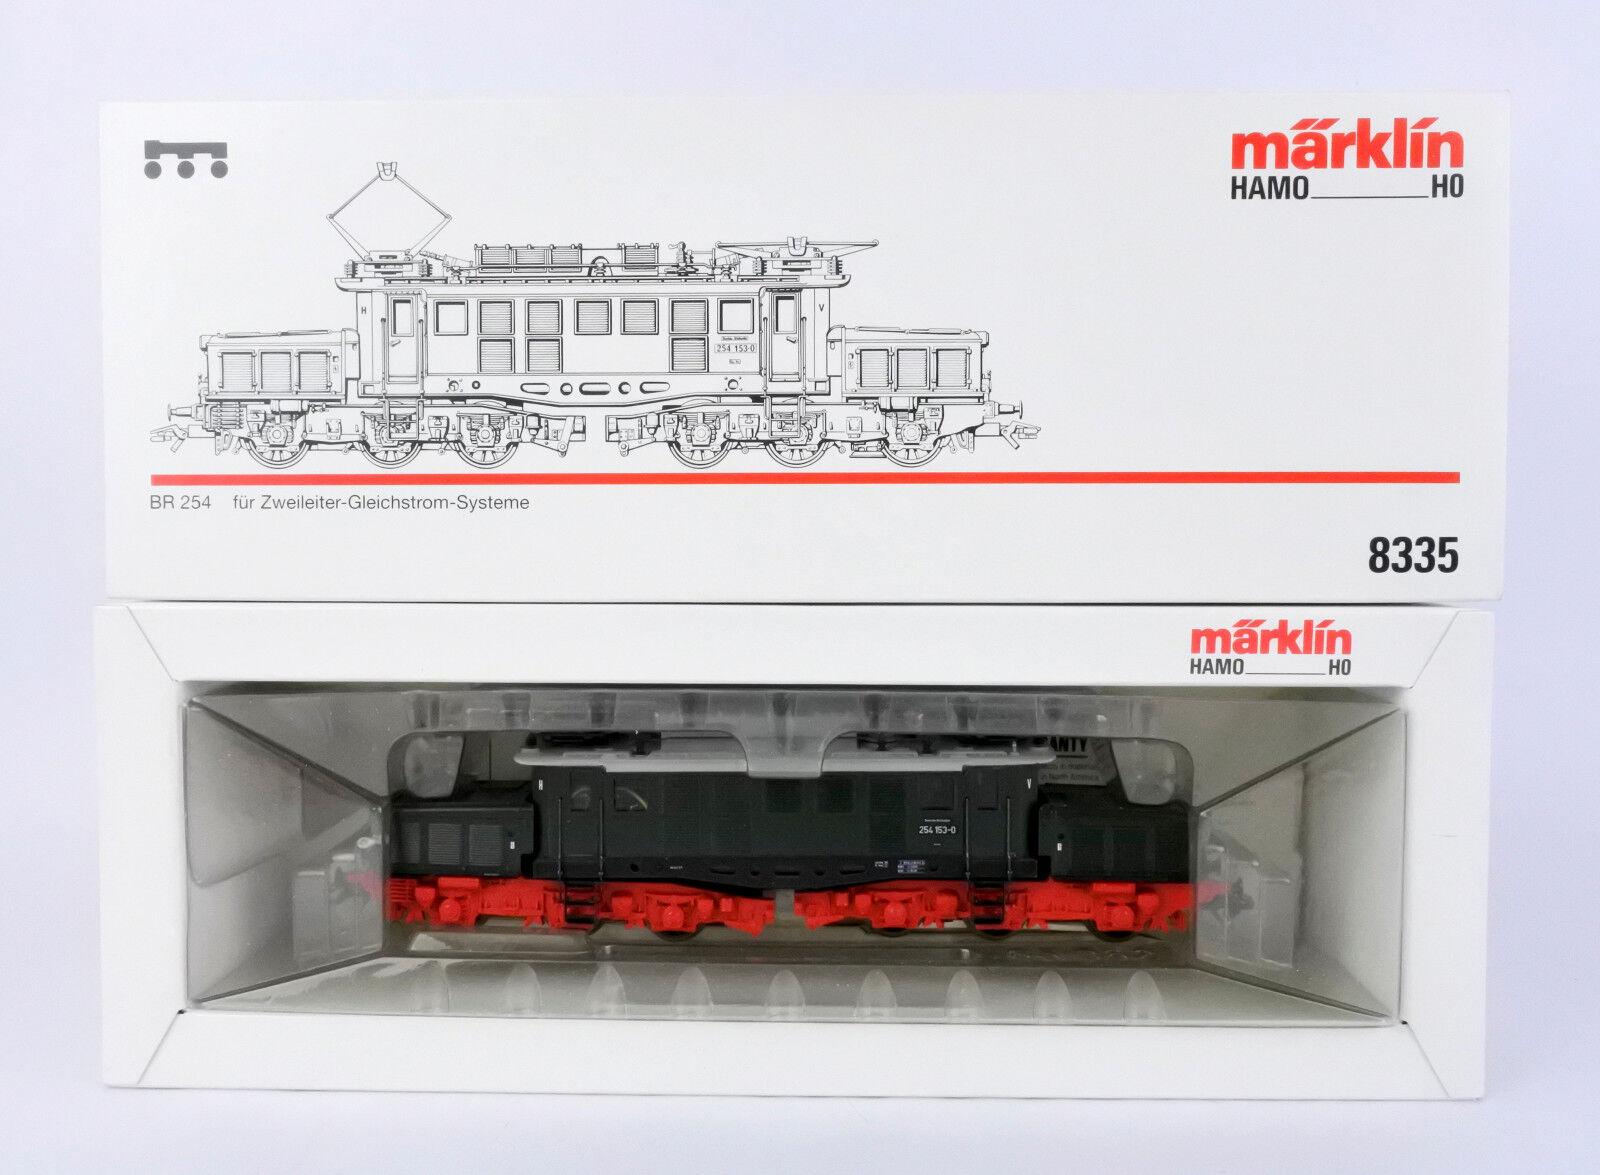 MARKLIN / HAMO HO SCALE 8335 verde BR BR BR 254 CROCODILE ELECTRIC ENGINE DC 2-RAIL c5b606